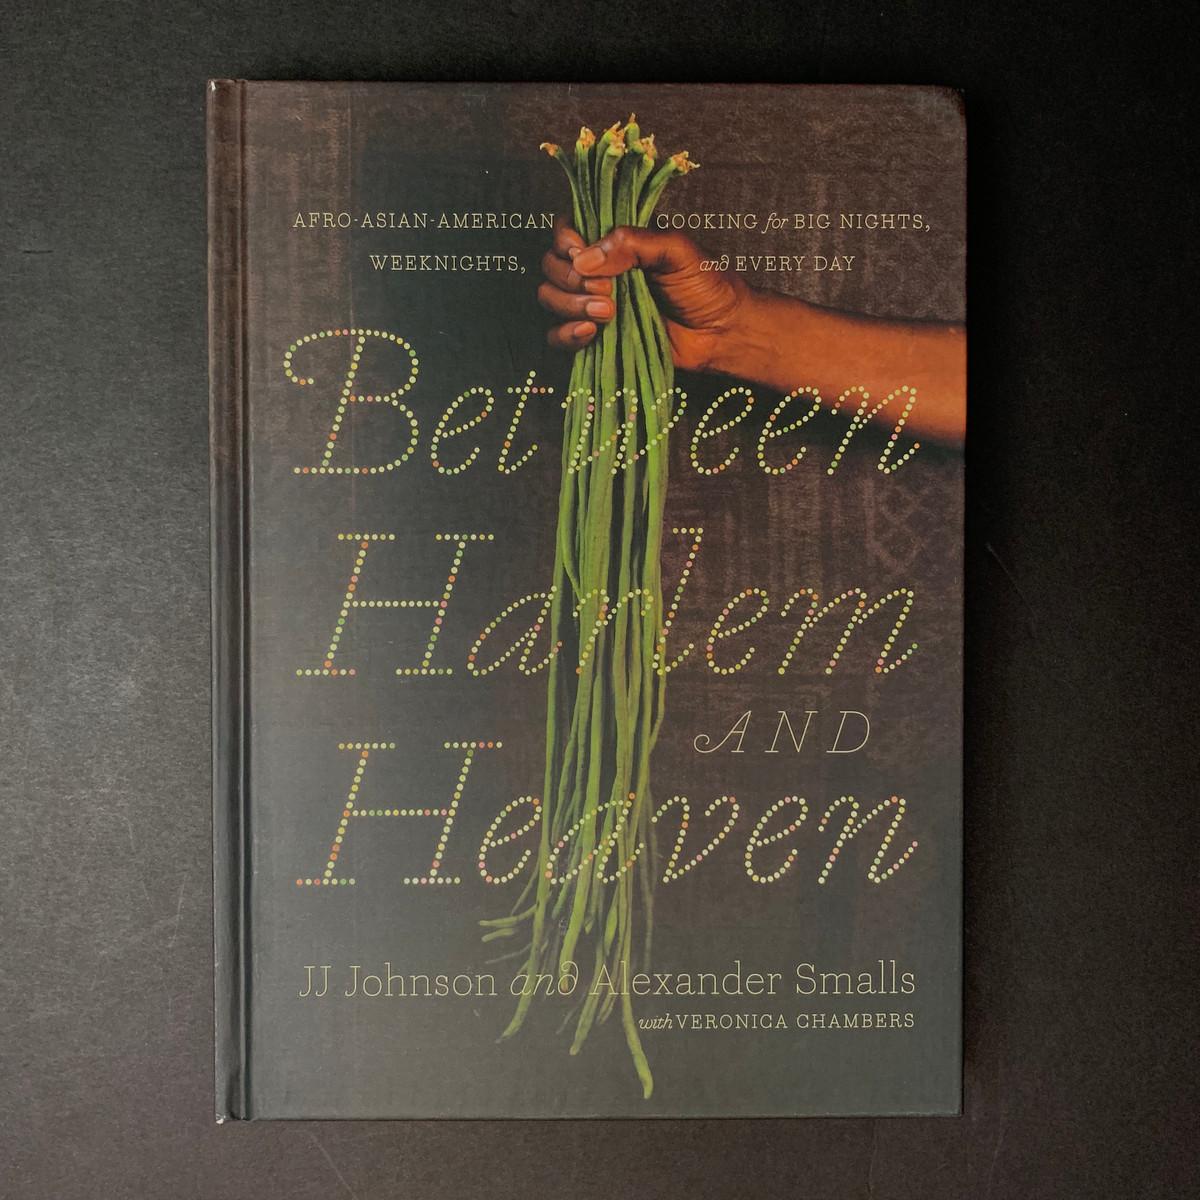 Between Harlem & Heaven    Alexander Smalls , JJ Johnson, Veronica Chambers